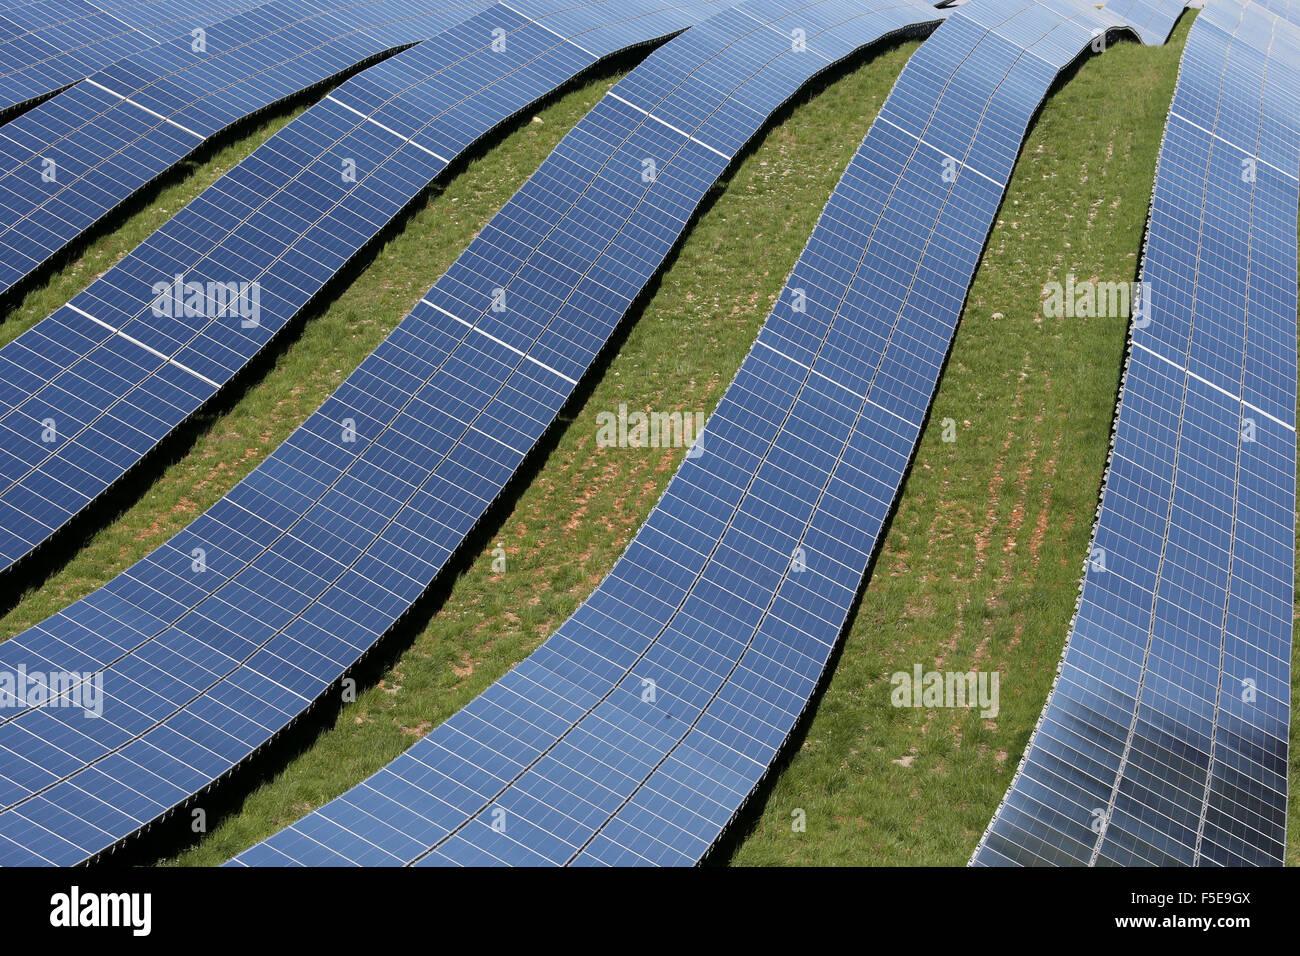 Solar farm, detail of photovoltaic power plant, Alpes-de-Haute-Provence, France, Europe - Stock Image